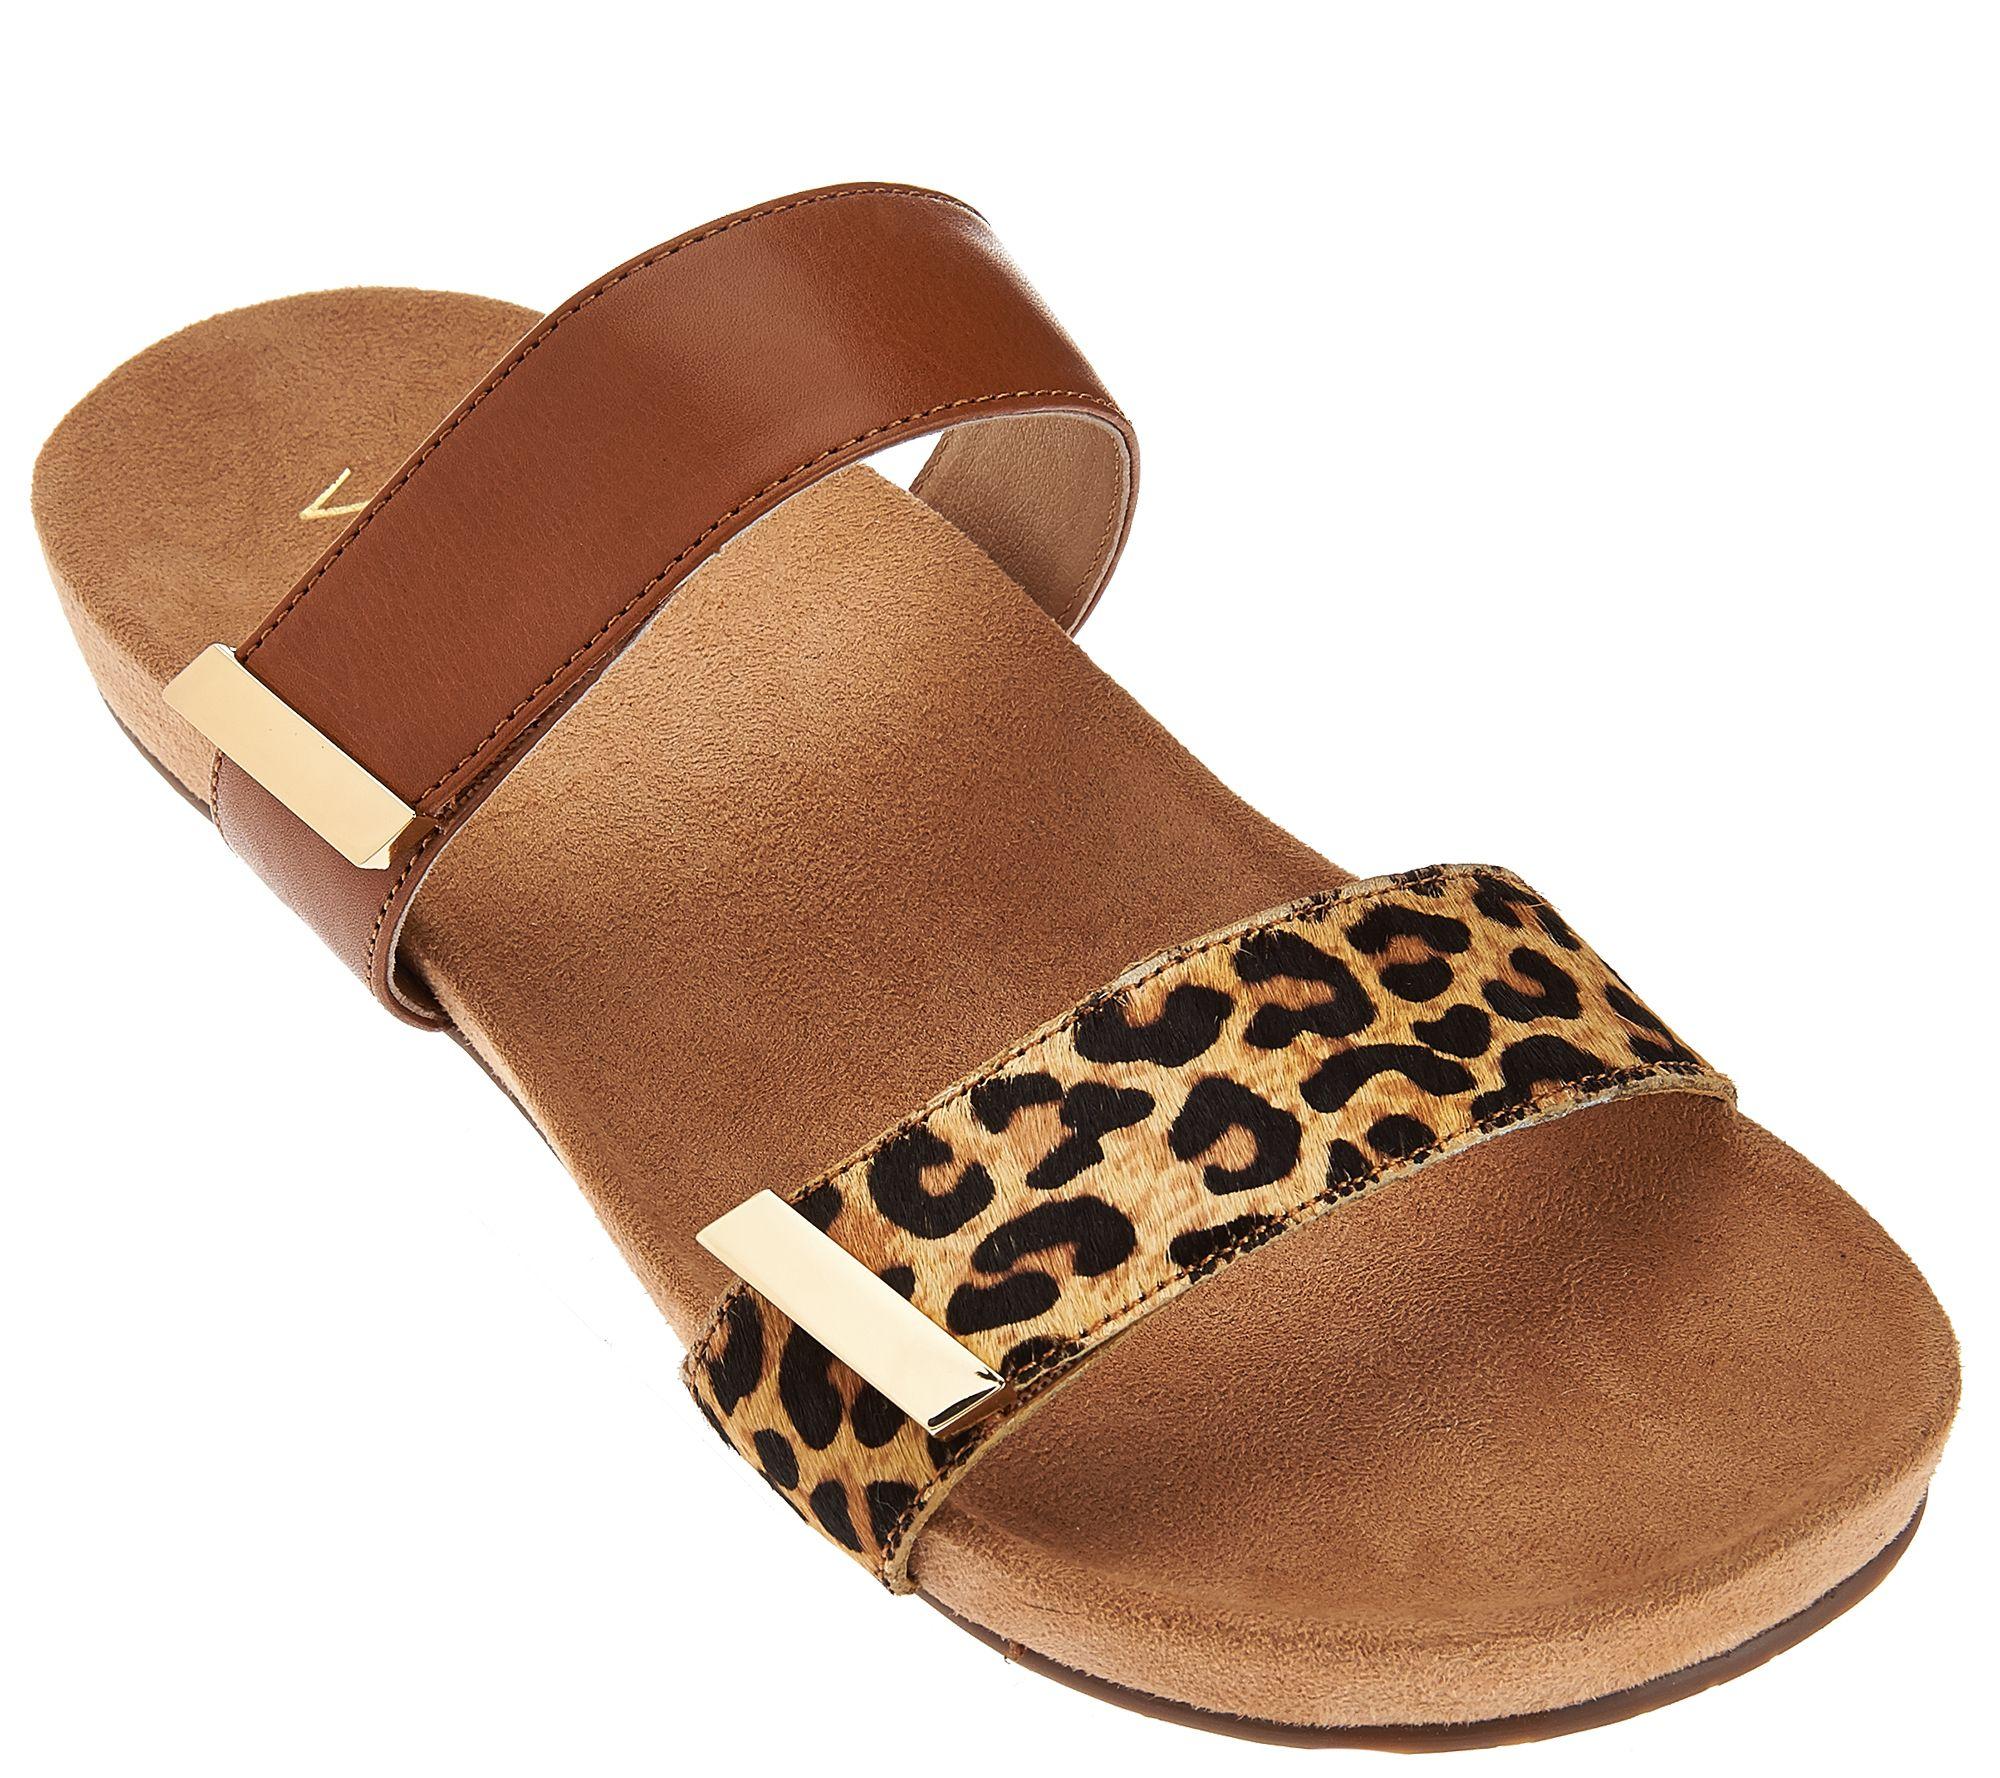 dcff682b3d9b Vionic Orthotic Leather and Haircalf Slide Sandals - Jura - Page 1 — QVC.com